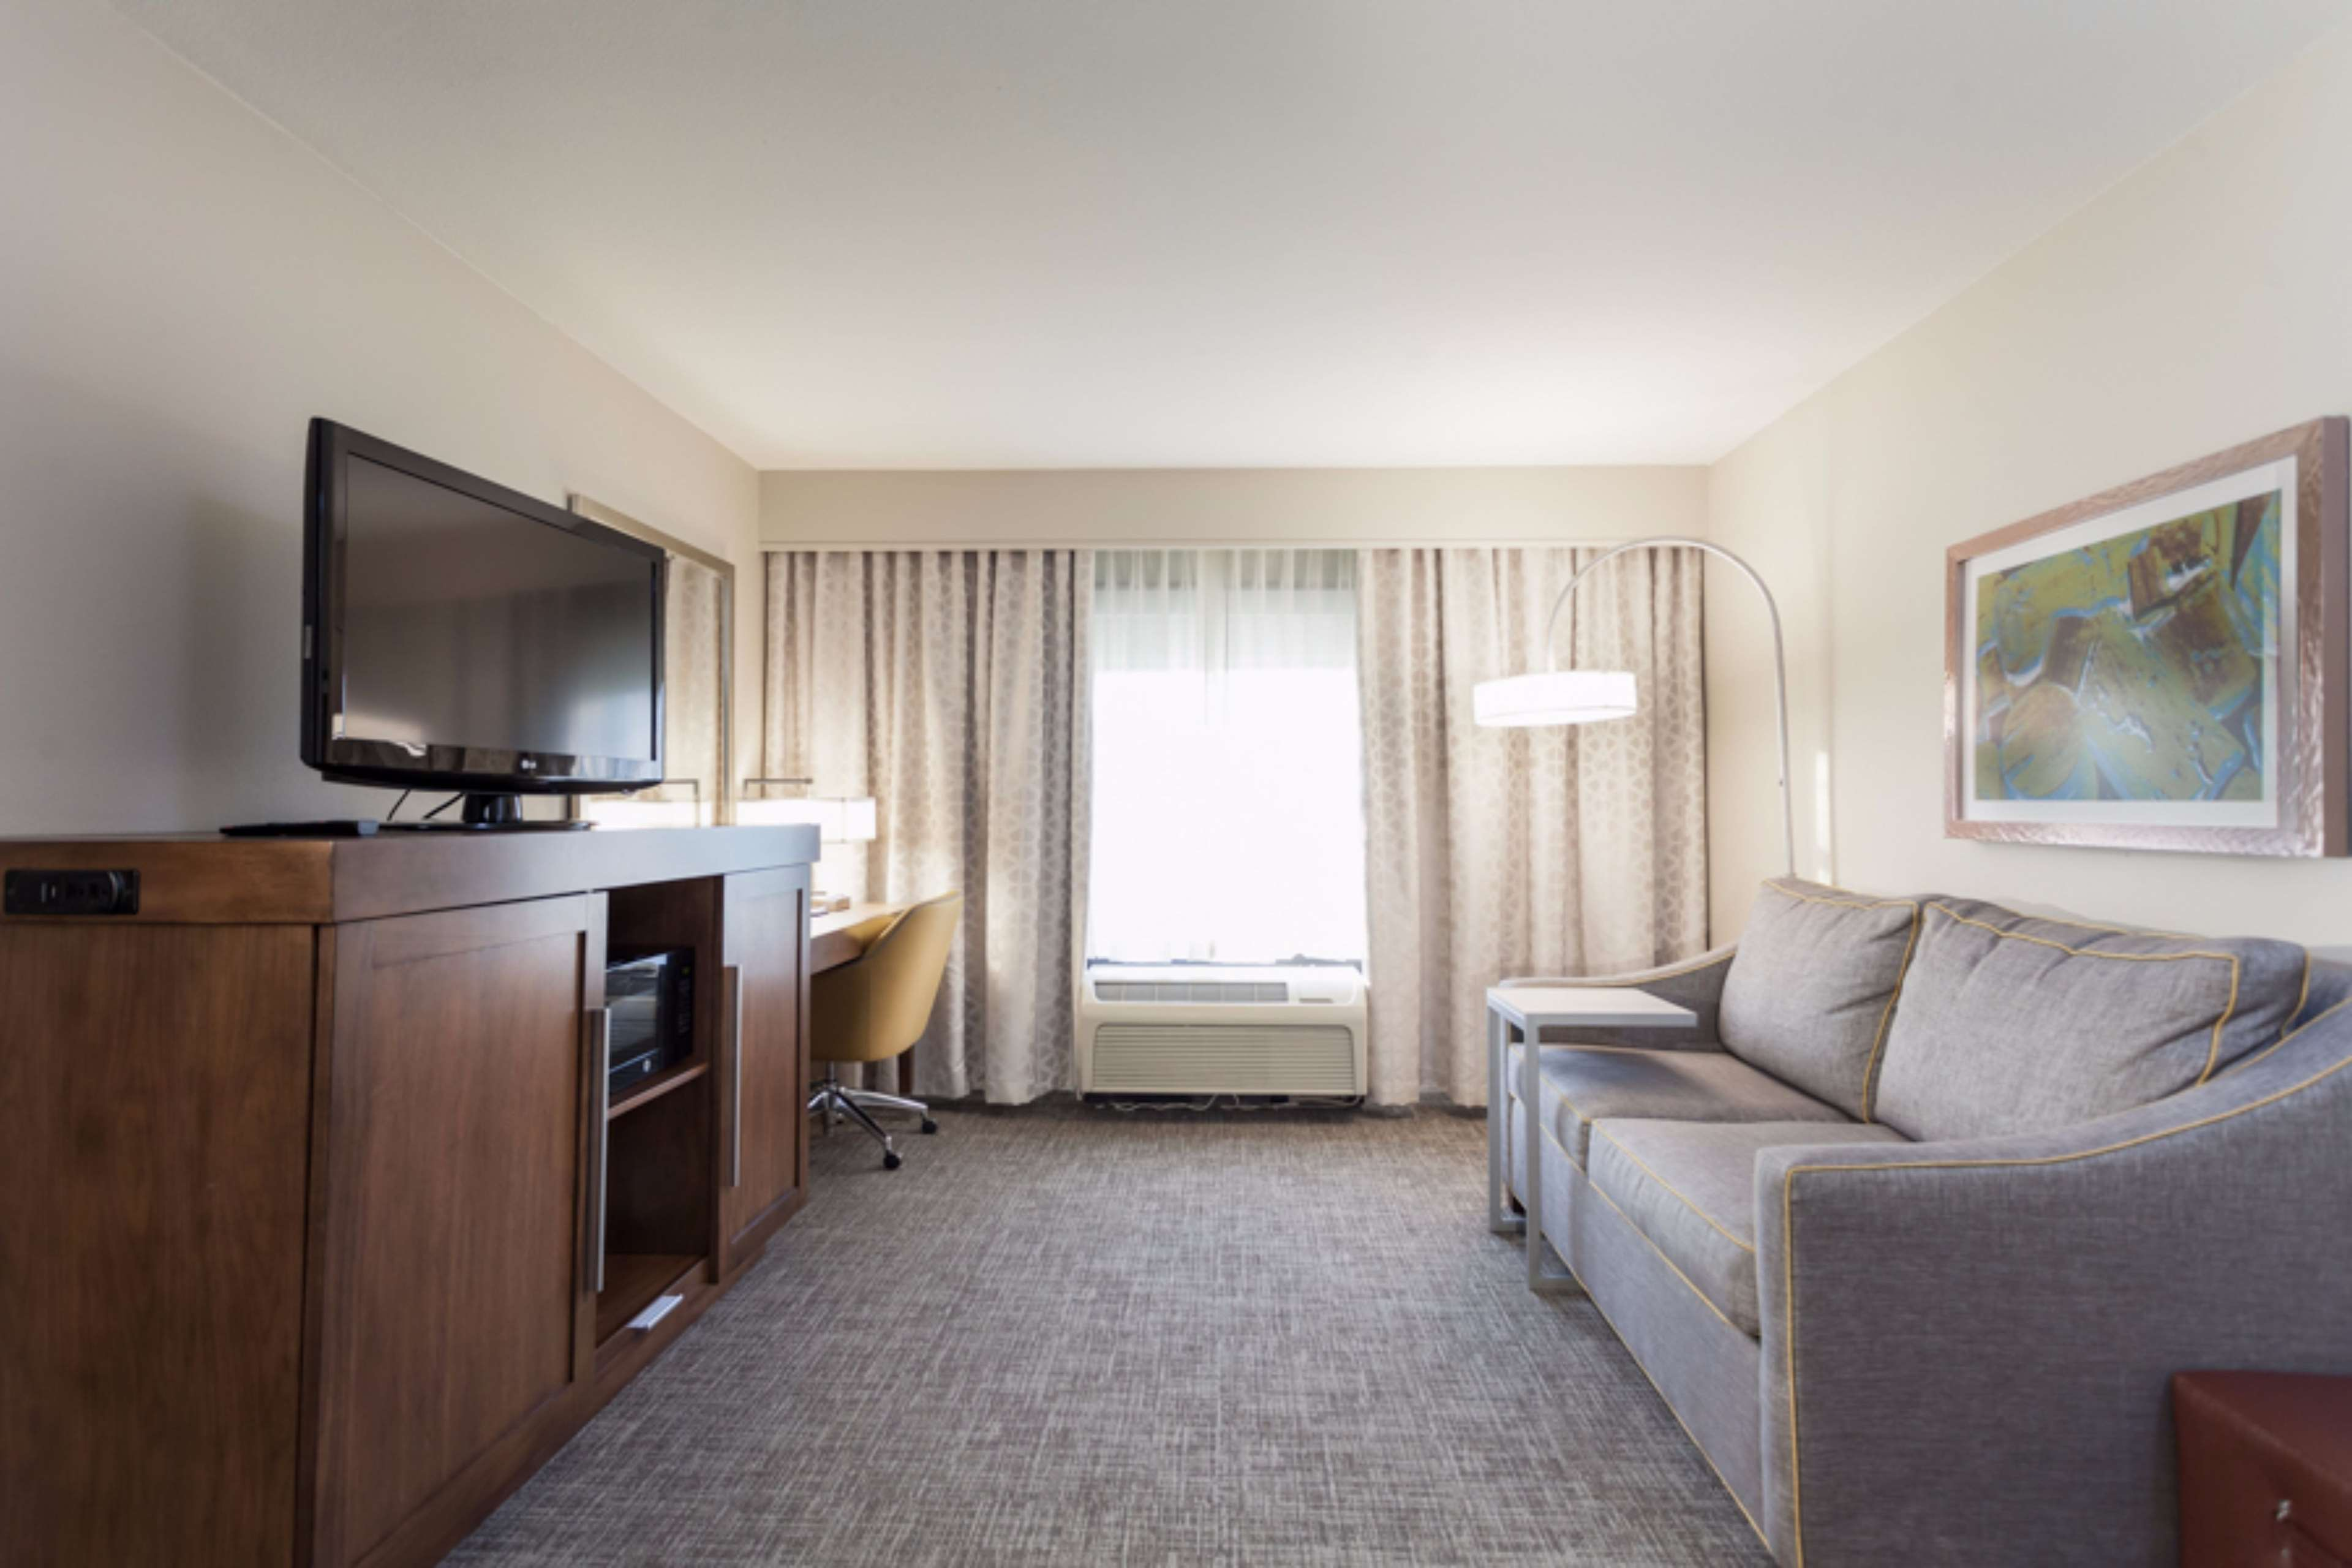 Hampton Inn & Suites Dallas-DFW Airport North-Grapevine image 14